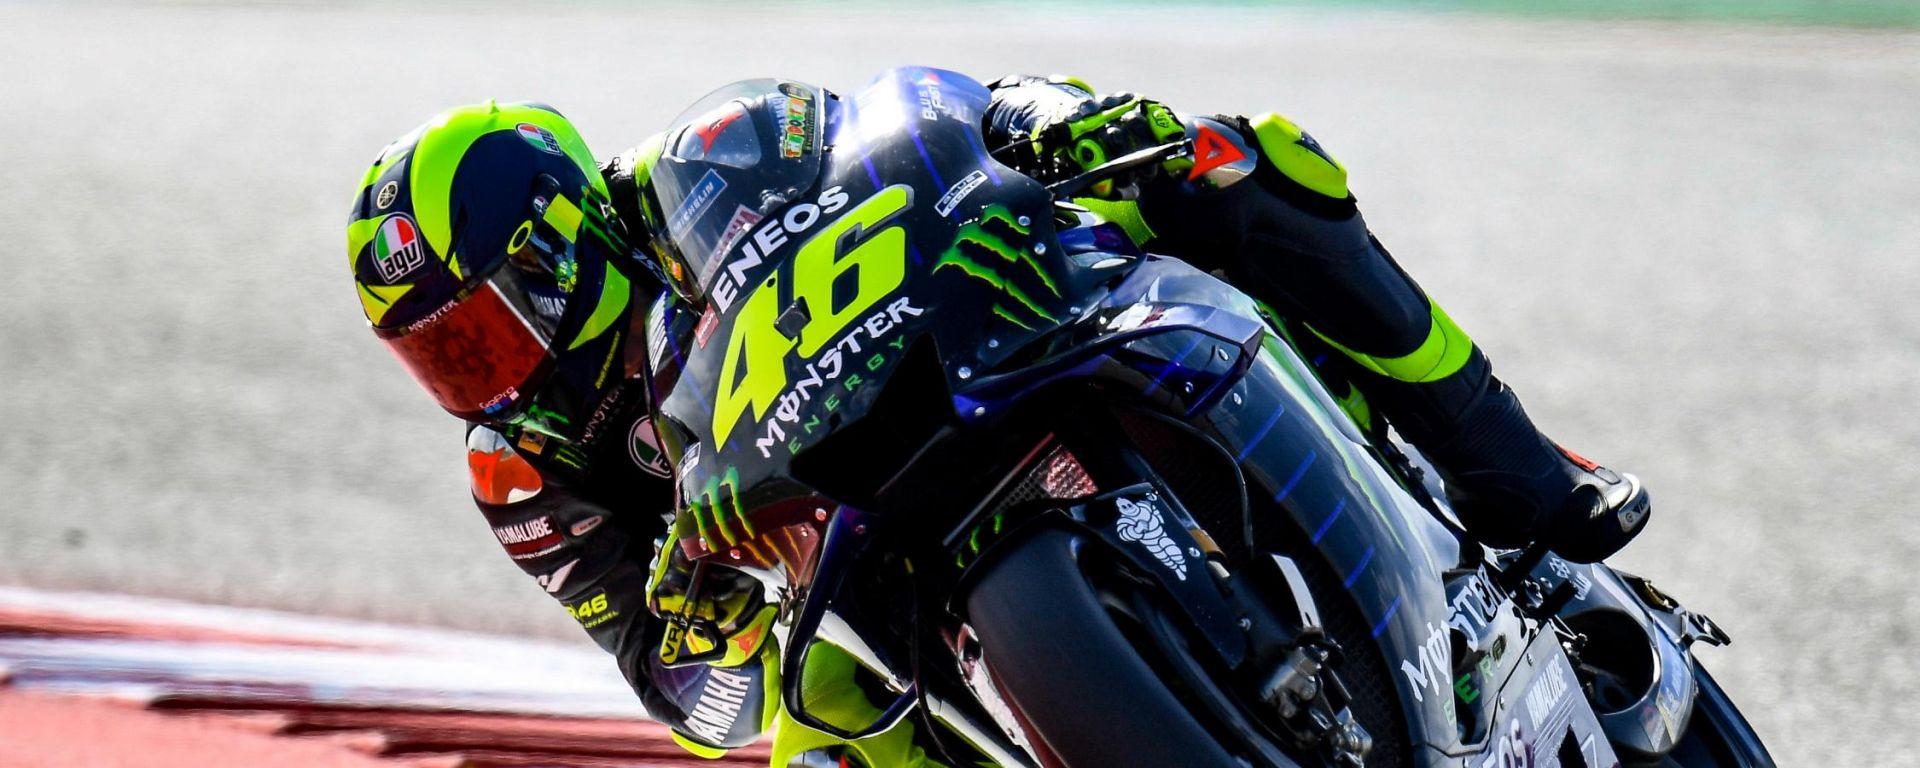 MotoGP Spagna 2019, Jerez: gli orari tv di Sky e TV8